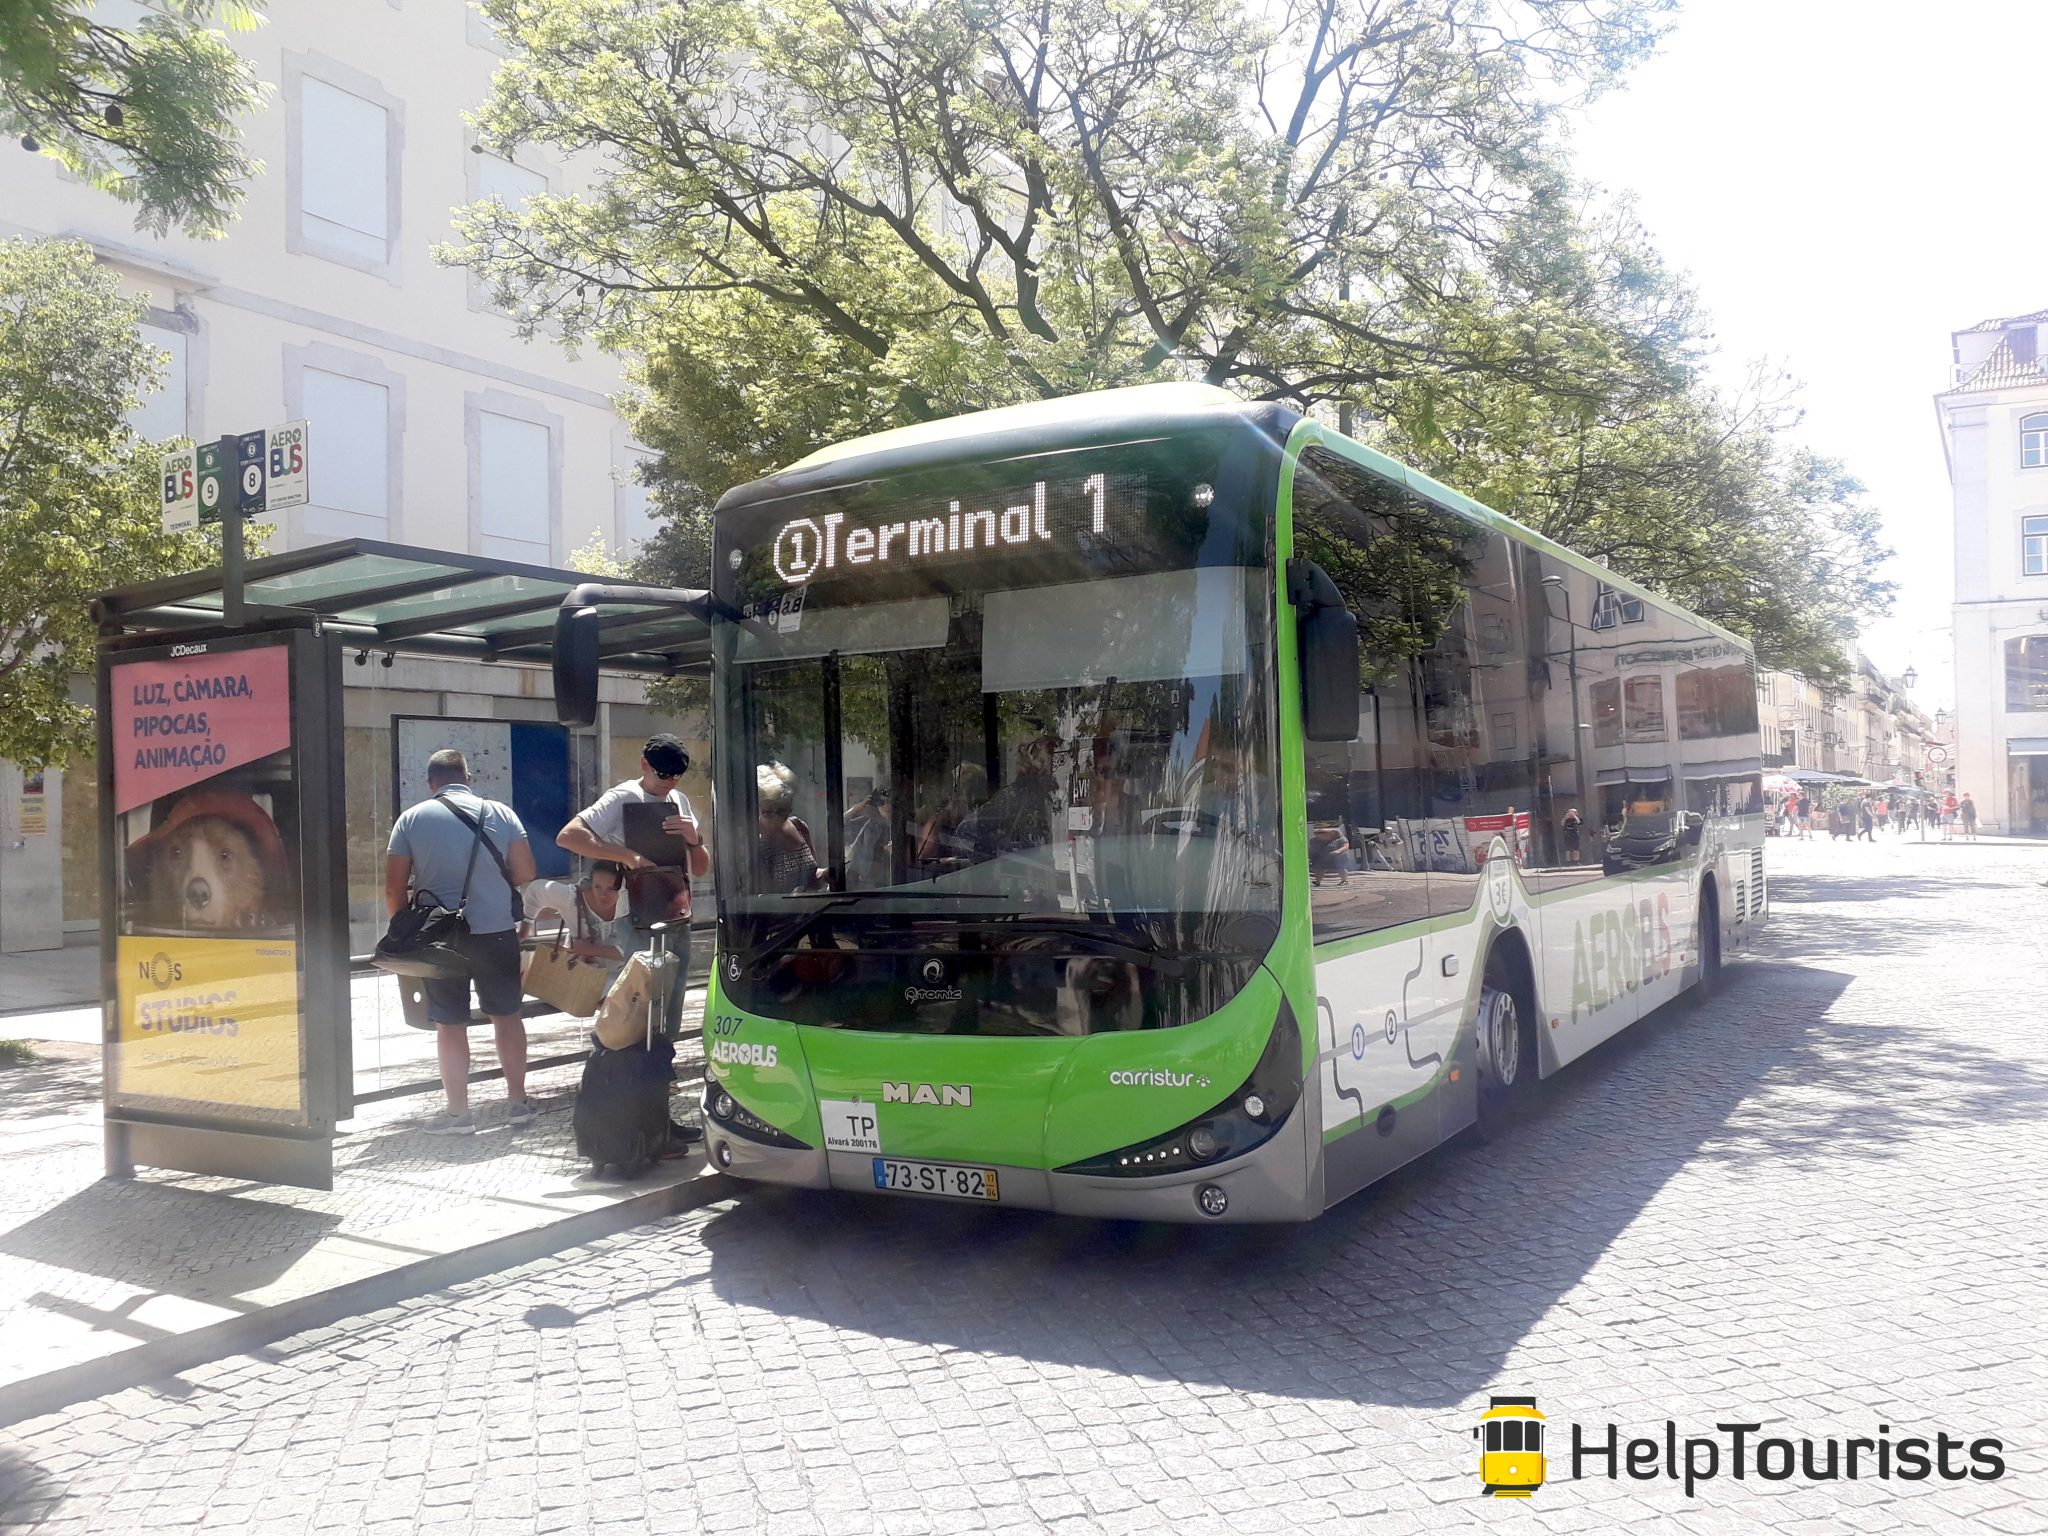 Lissabon Bus Flughafen Terminal 1